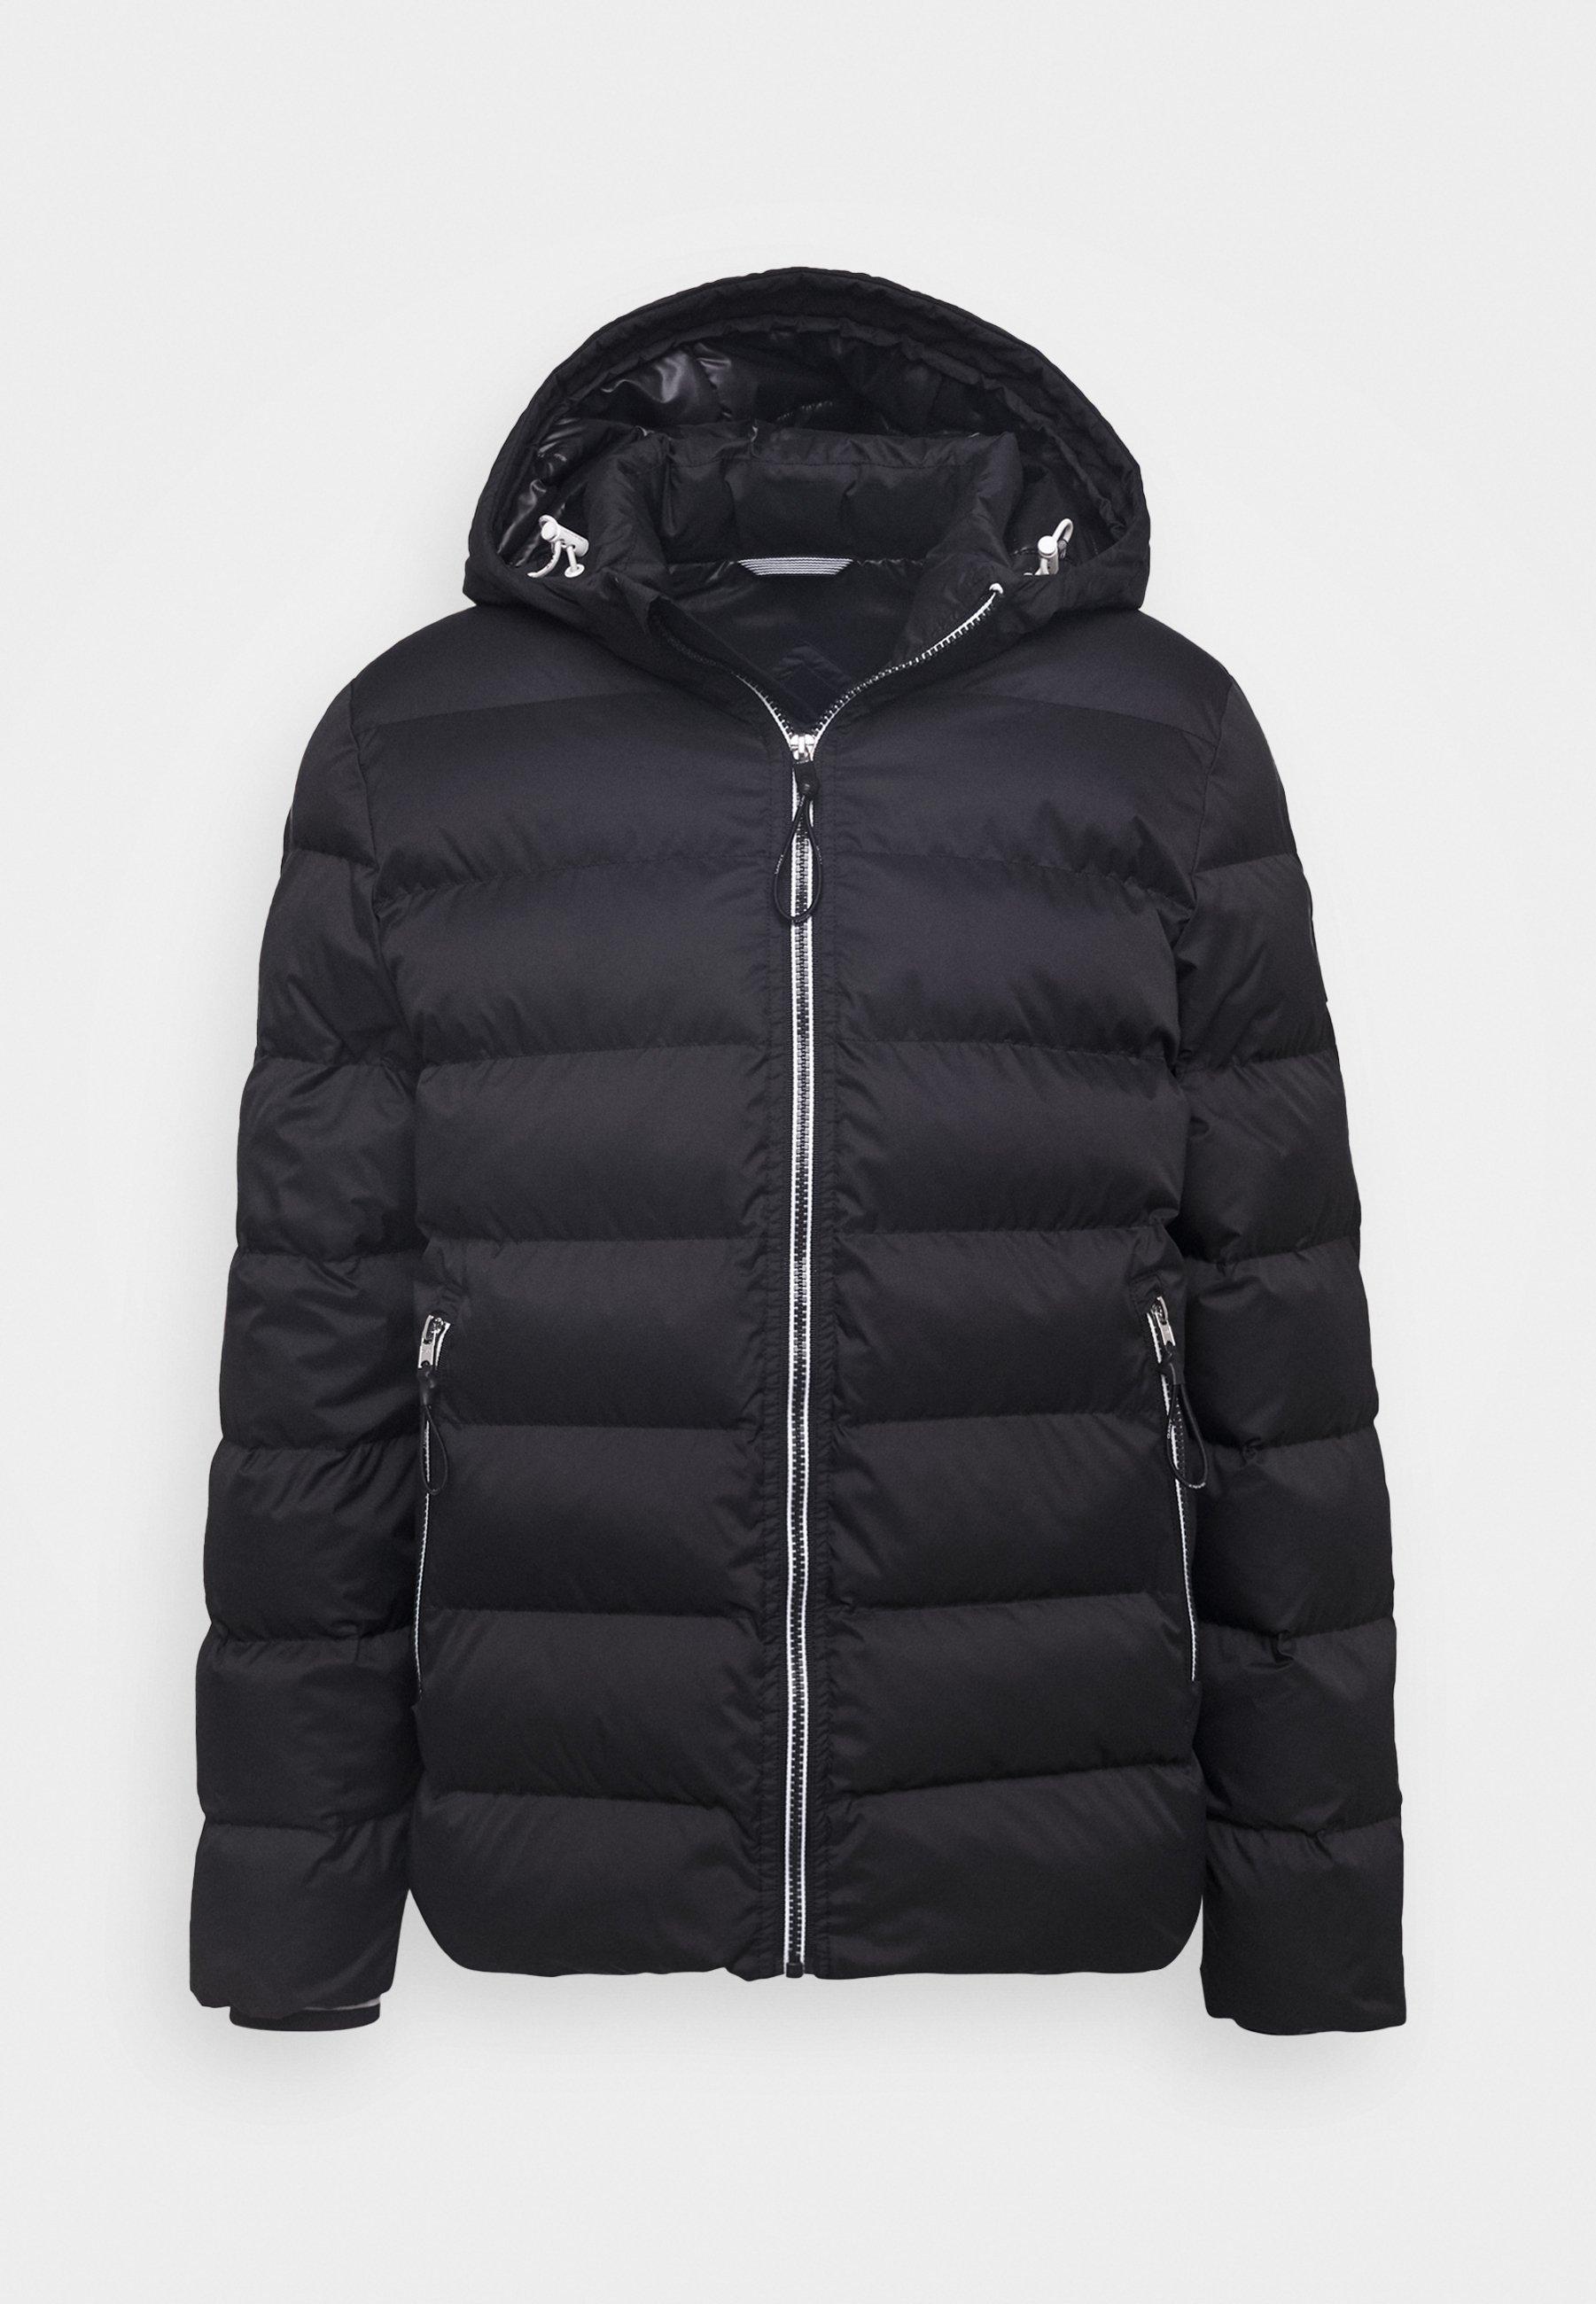 Gant The Active Cloud Jacket - Vinterjakke Black/svart